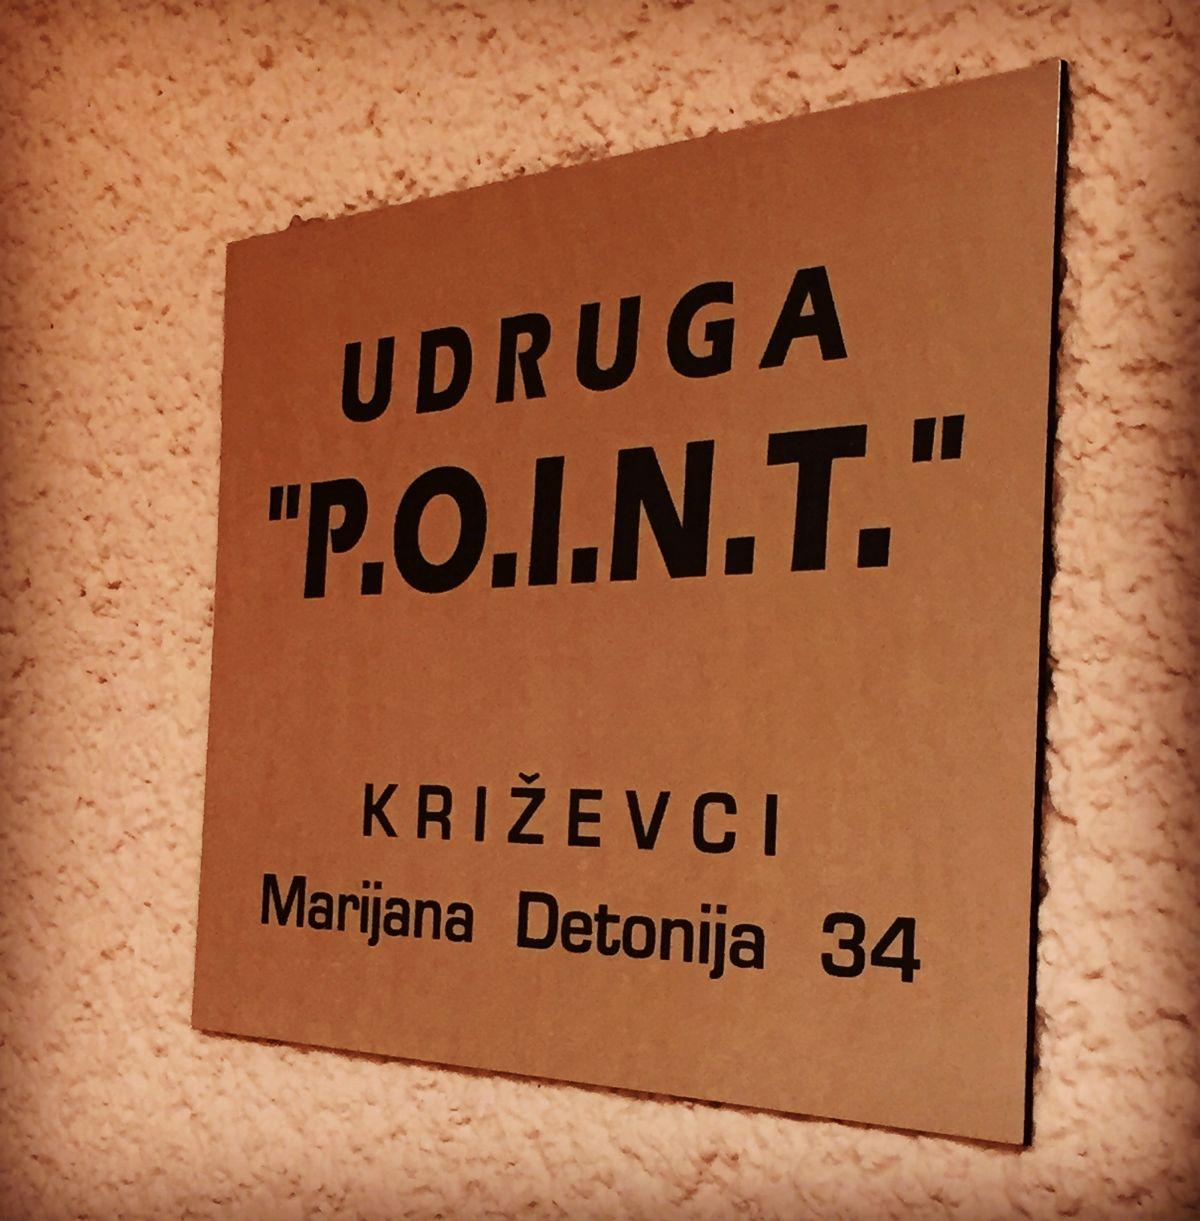 IMG_6090_udruga_point_znak_adresa_prostor_marijana_detonija_34